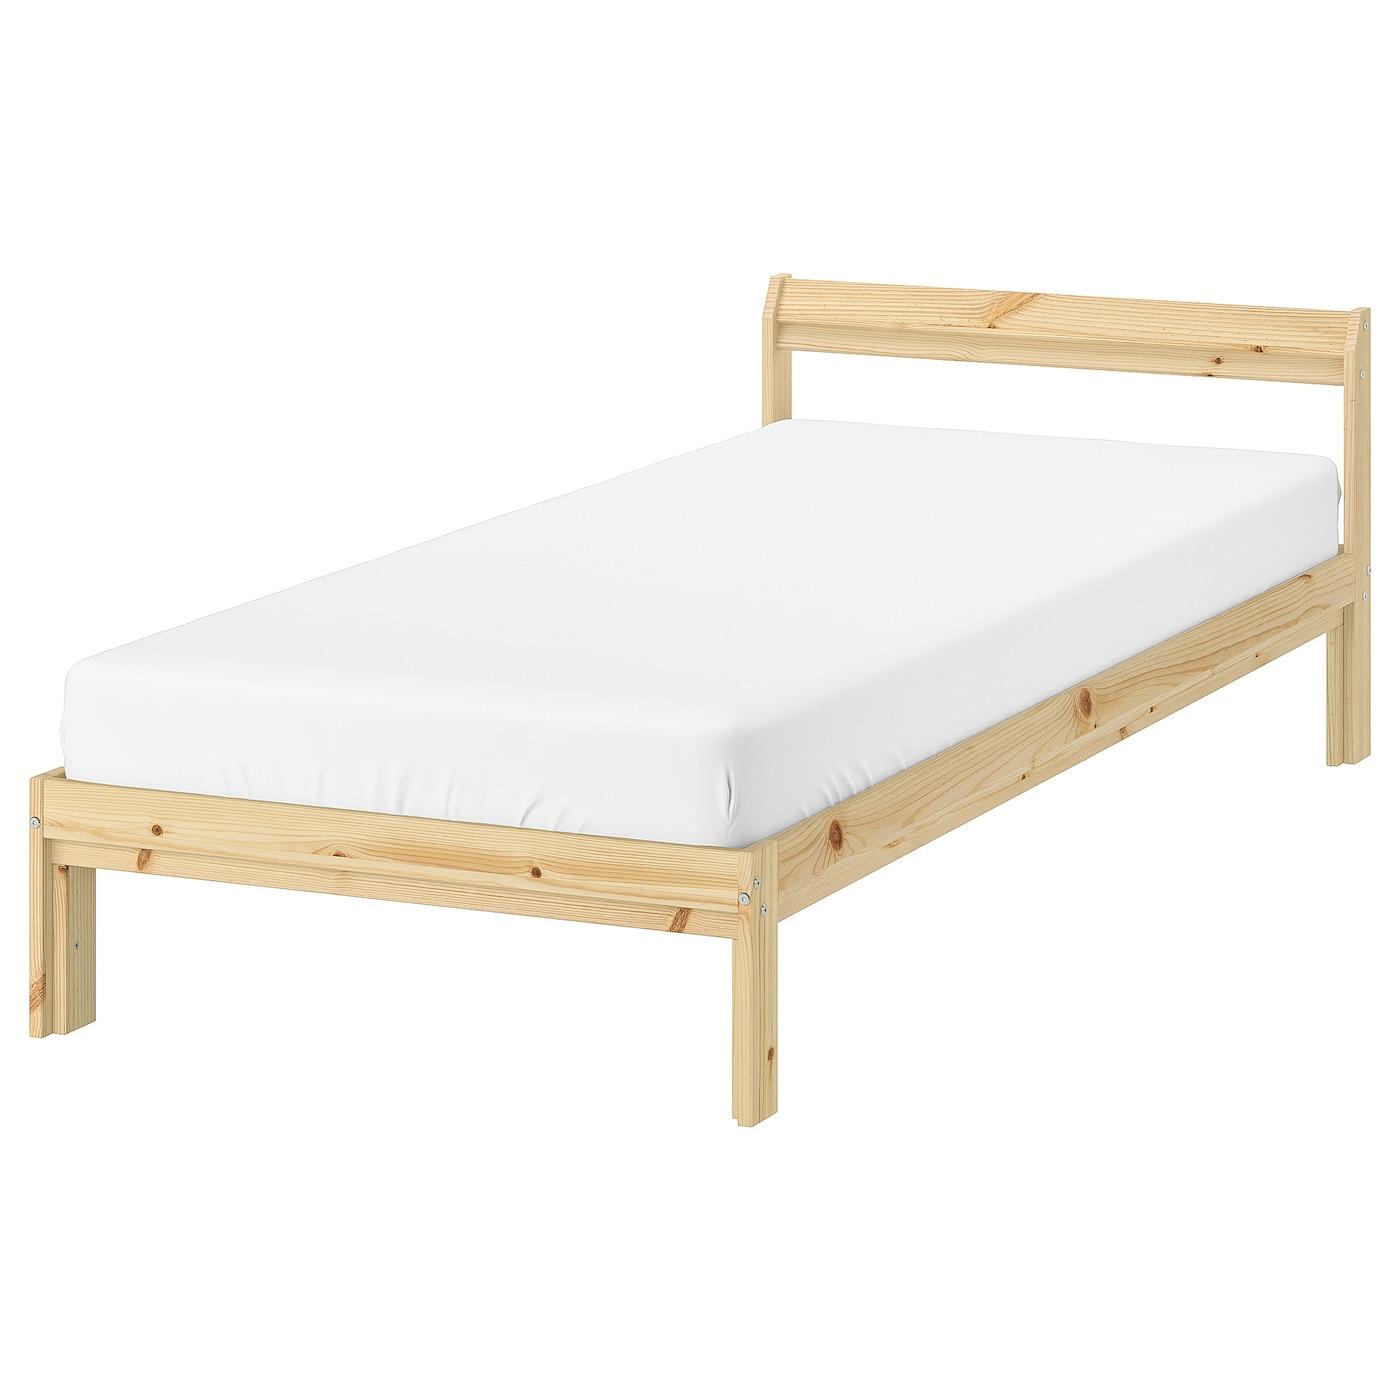 Verbazingwekkend NEIDEN Bedframe, berken grenen, Luröy, 90x200 cm - IKEA GE-52